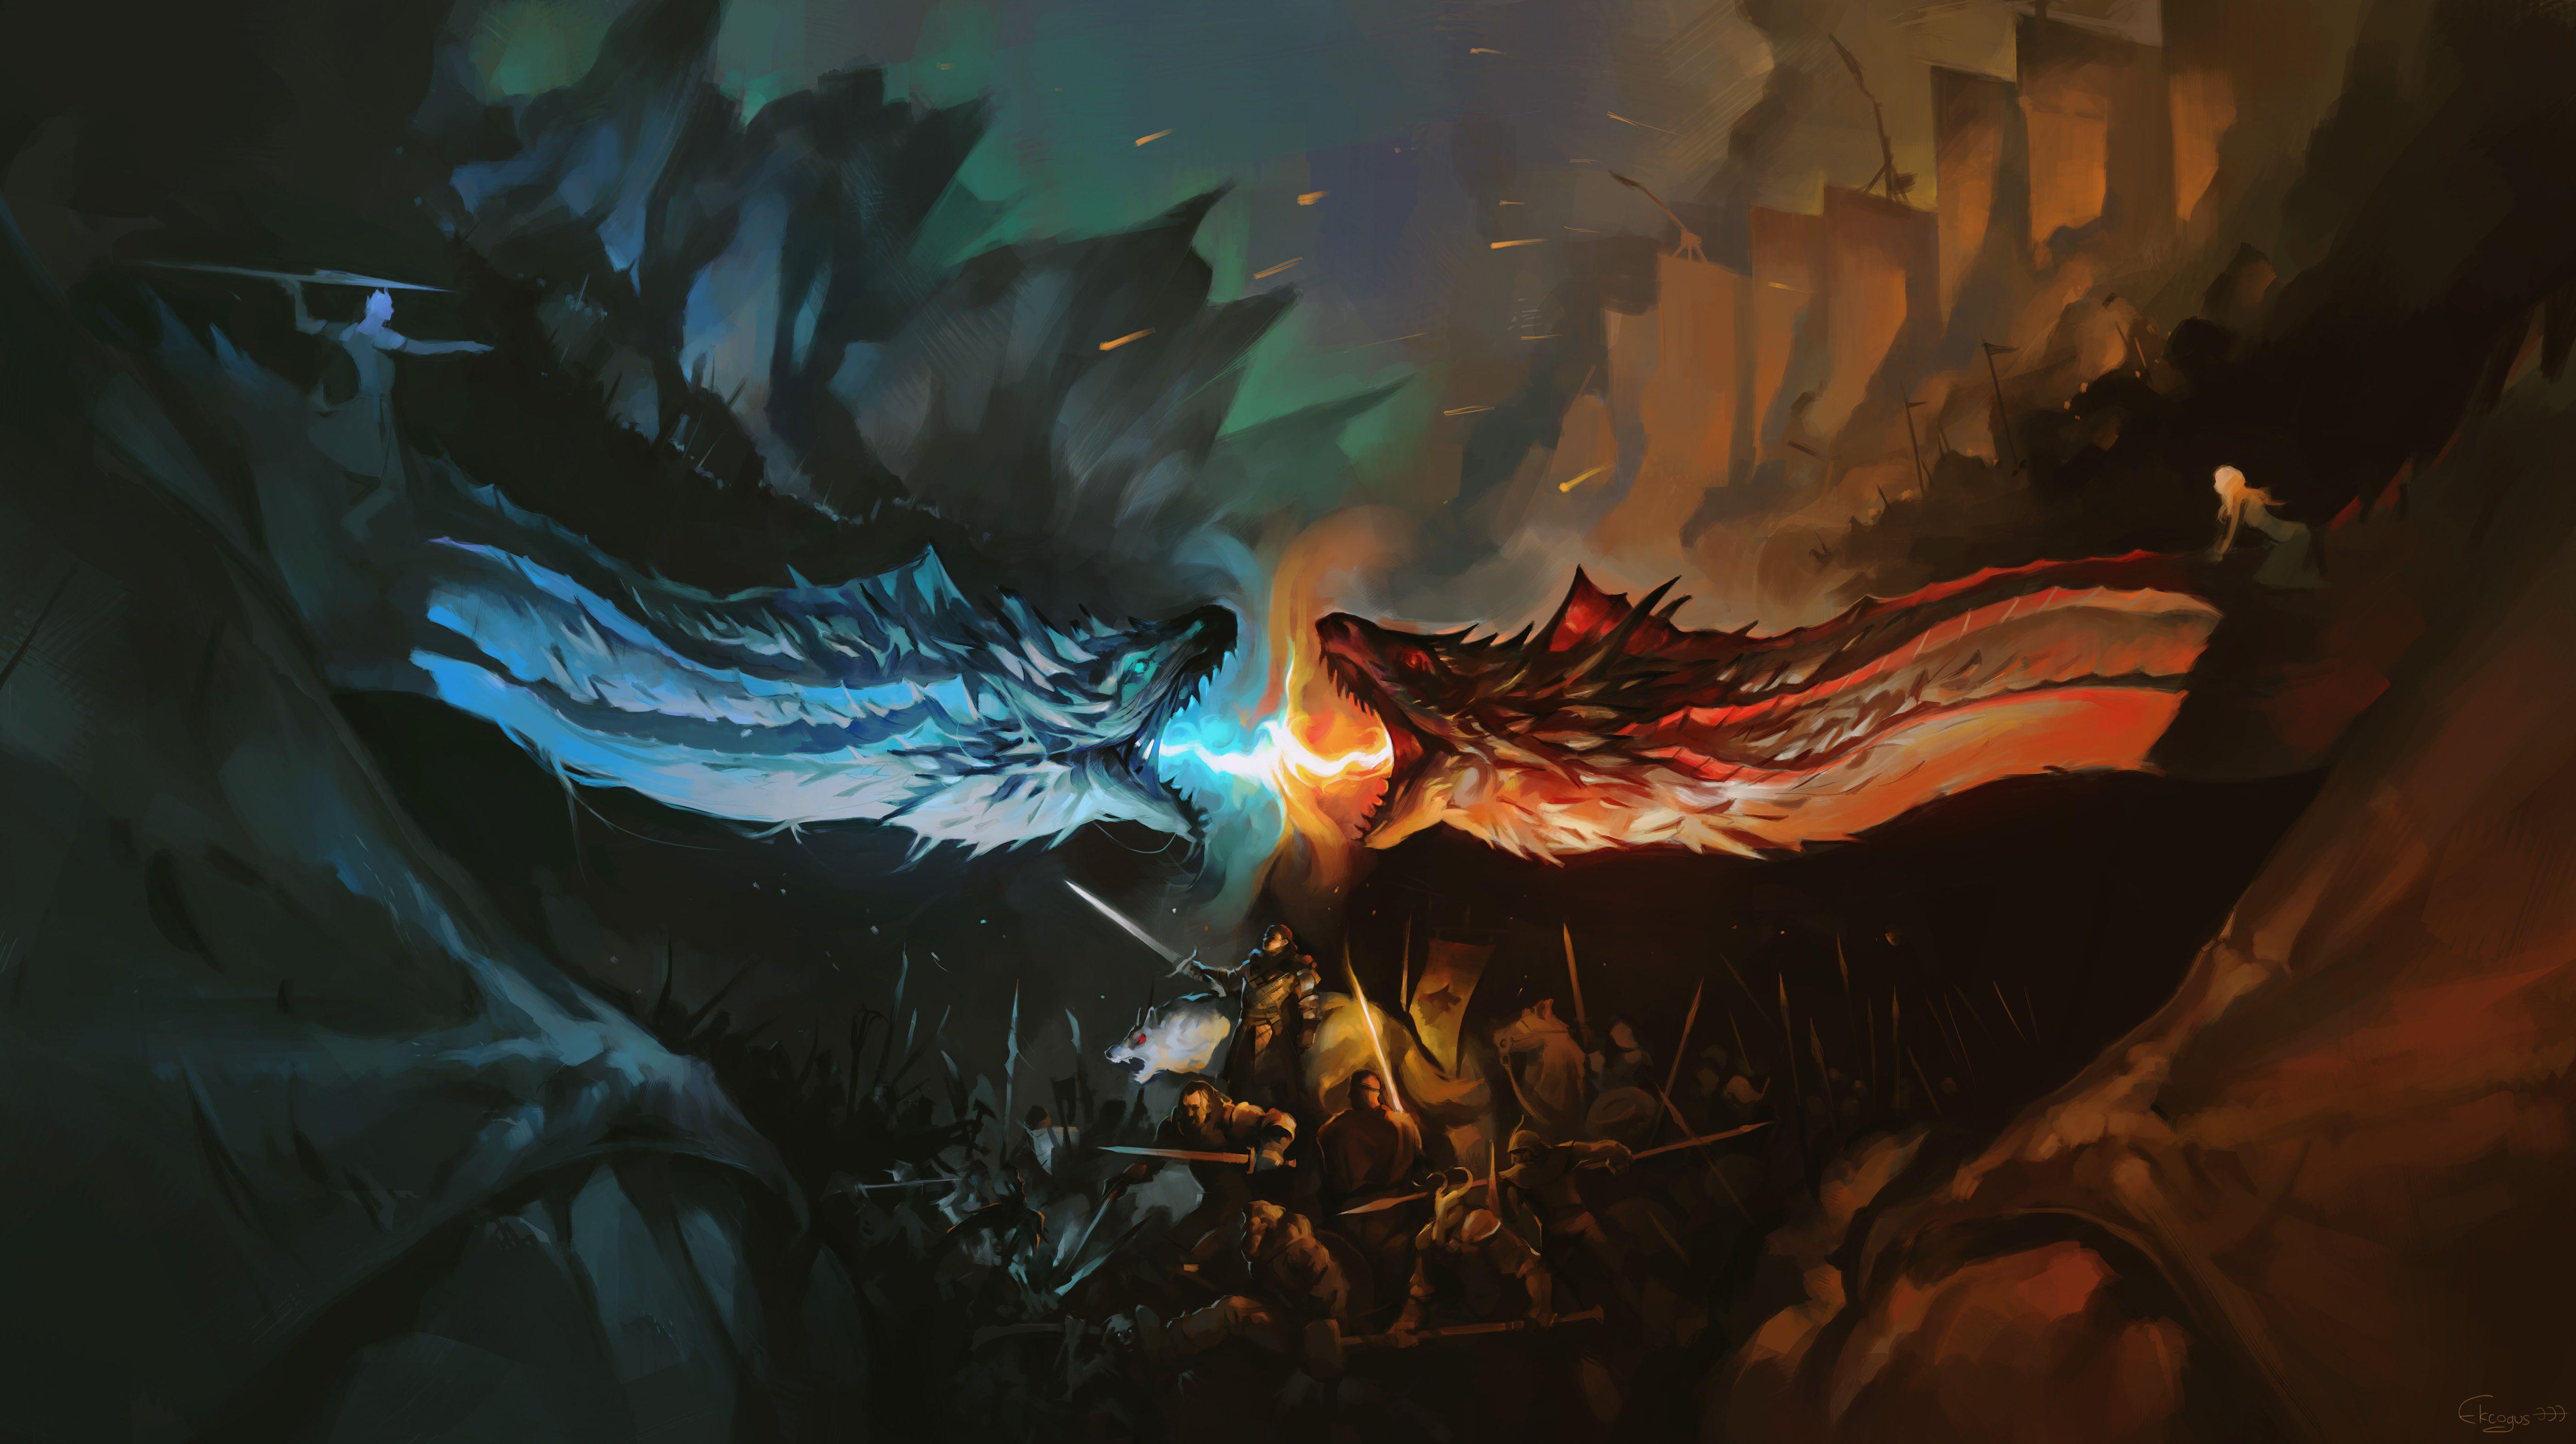 Game Of Thrones Season 7 Game Of Thrones Tv Shows Hd White Walkers 4k Dragon Artwork Artist Digital Art In 2020 Game Of Thrones Dragons Dragon Artwork Ice Dragon